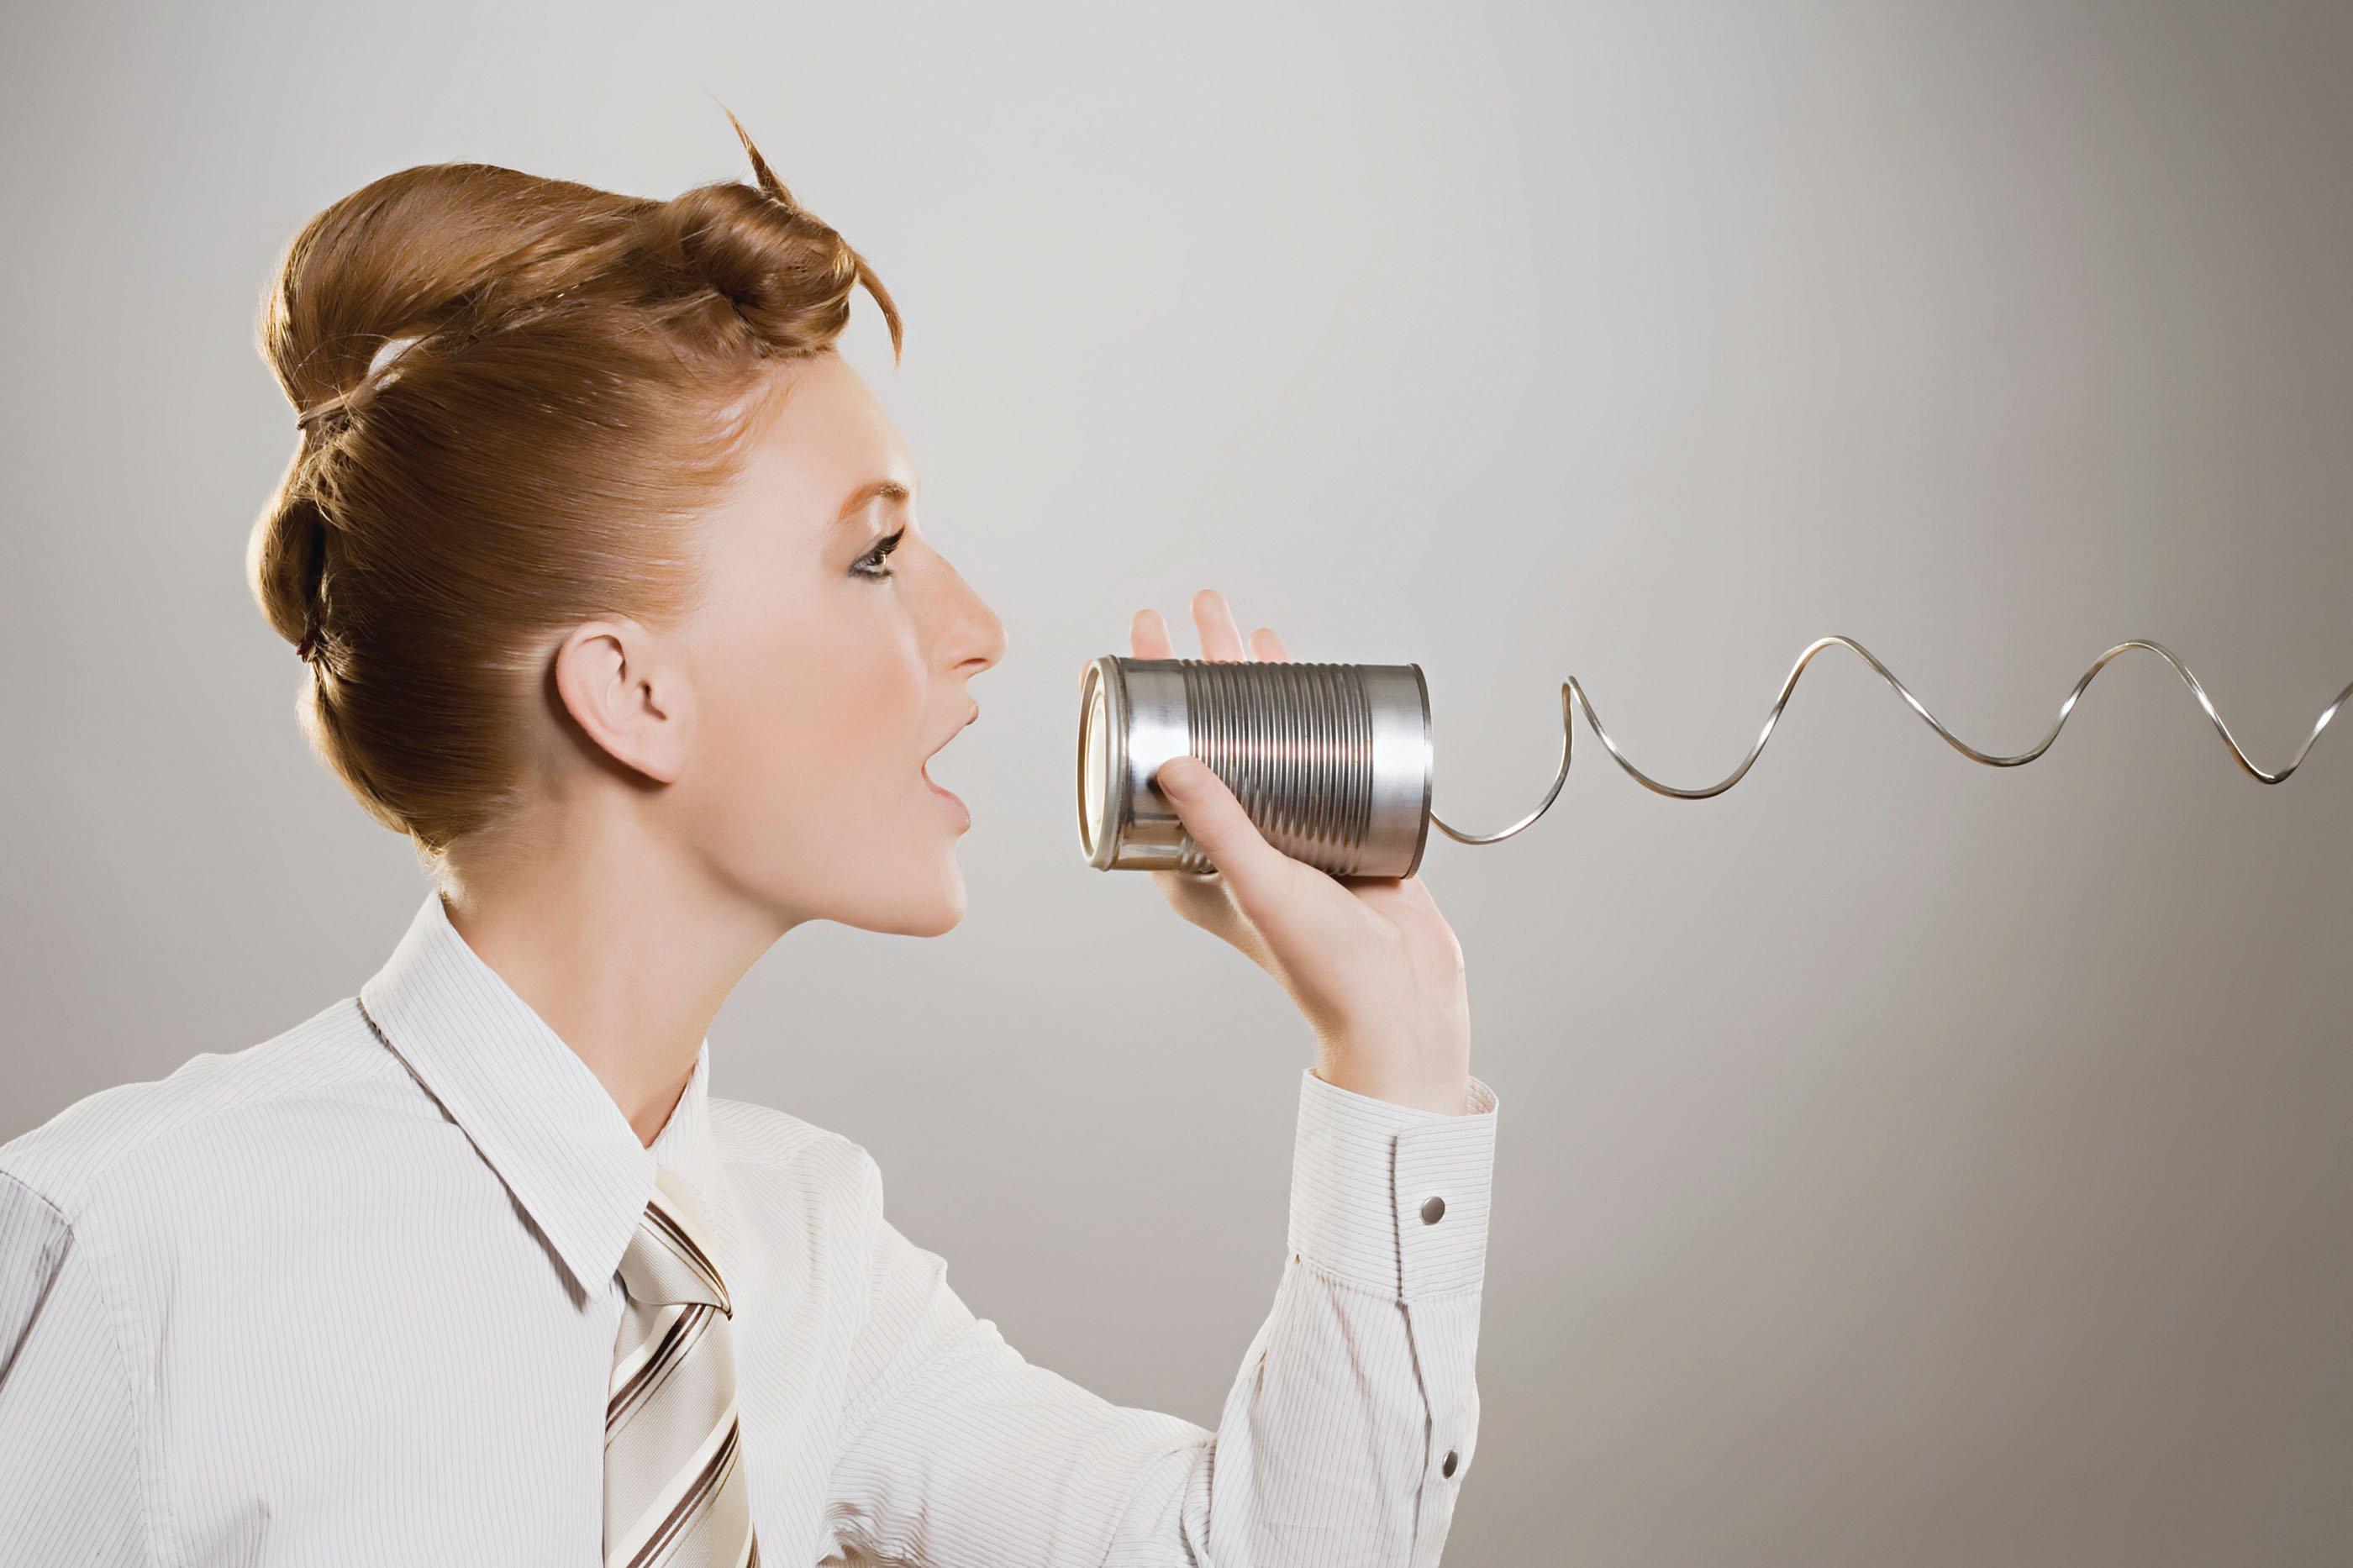 tin-can-phone